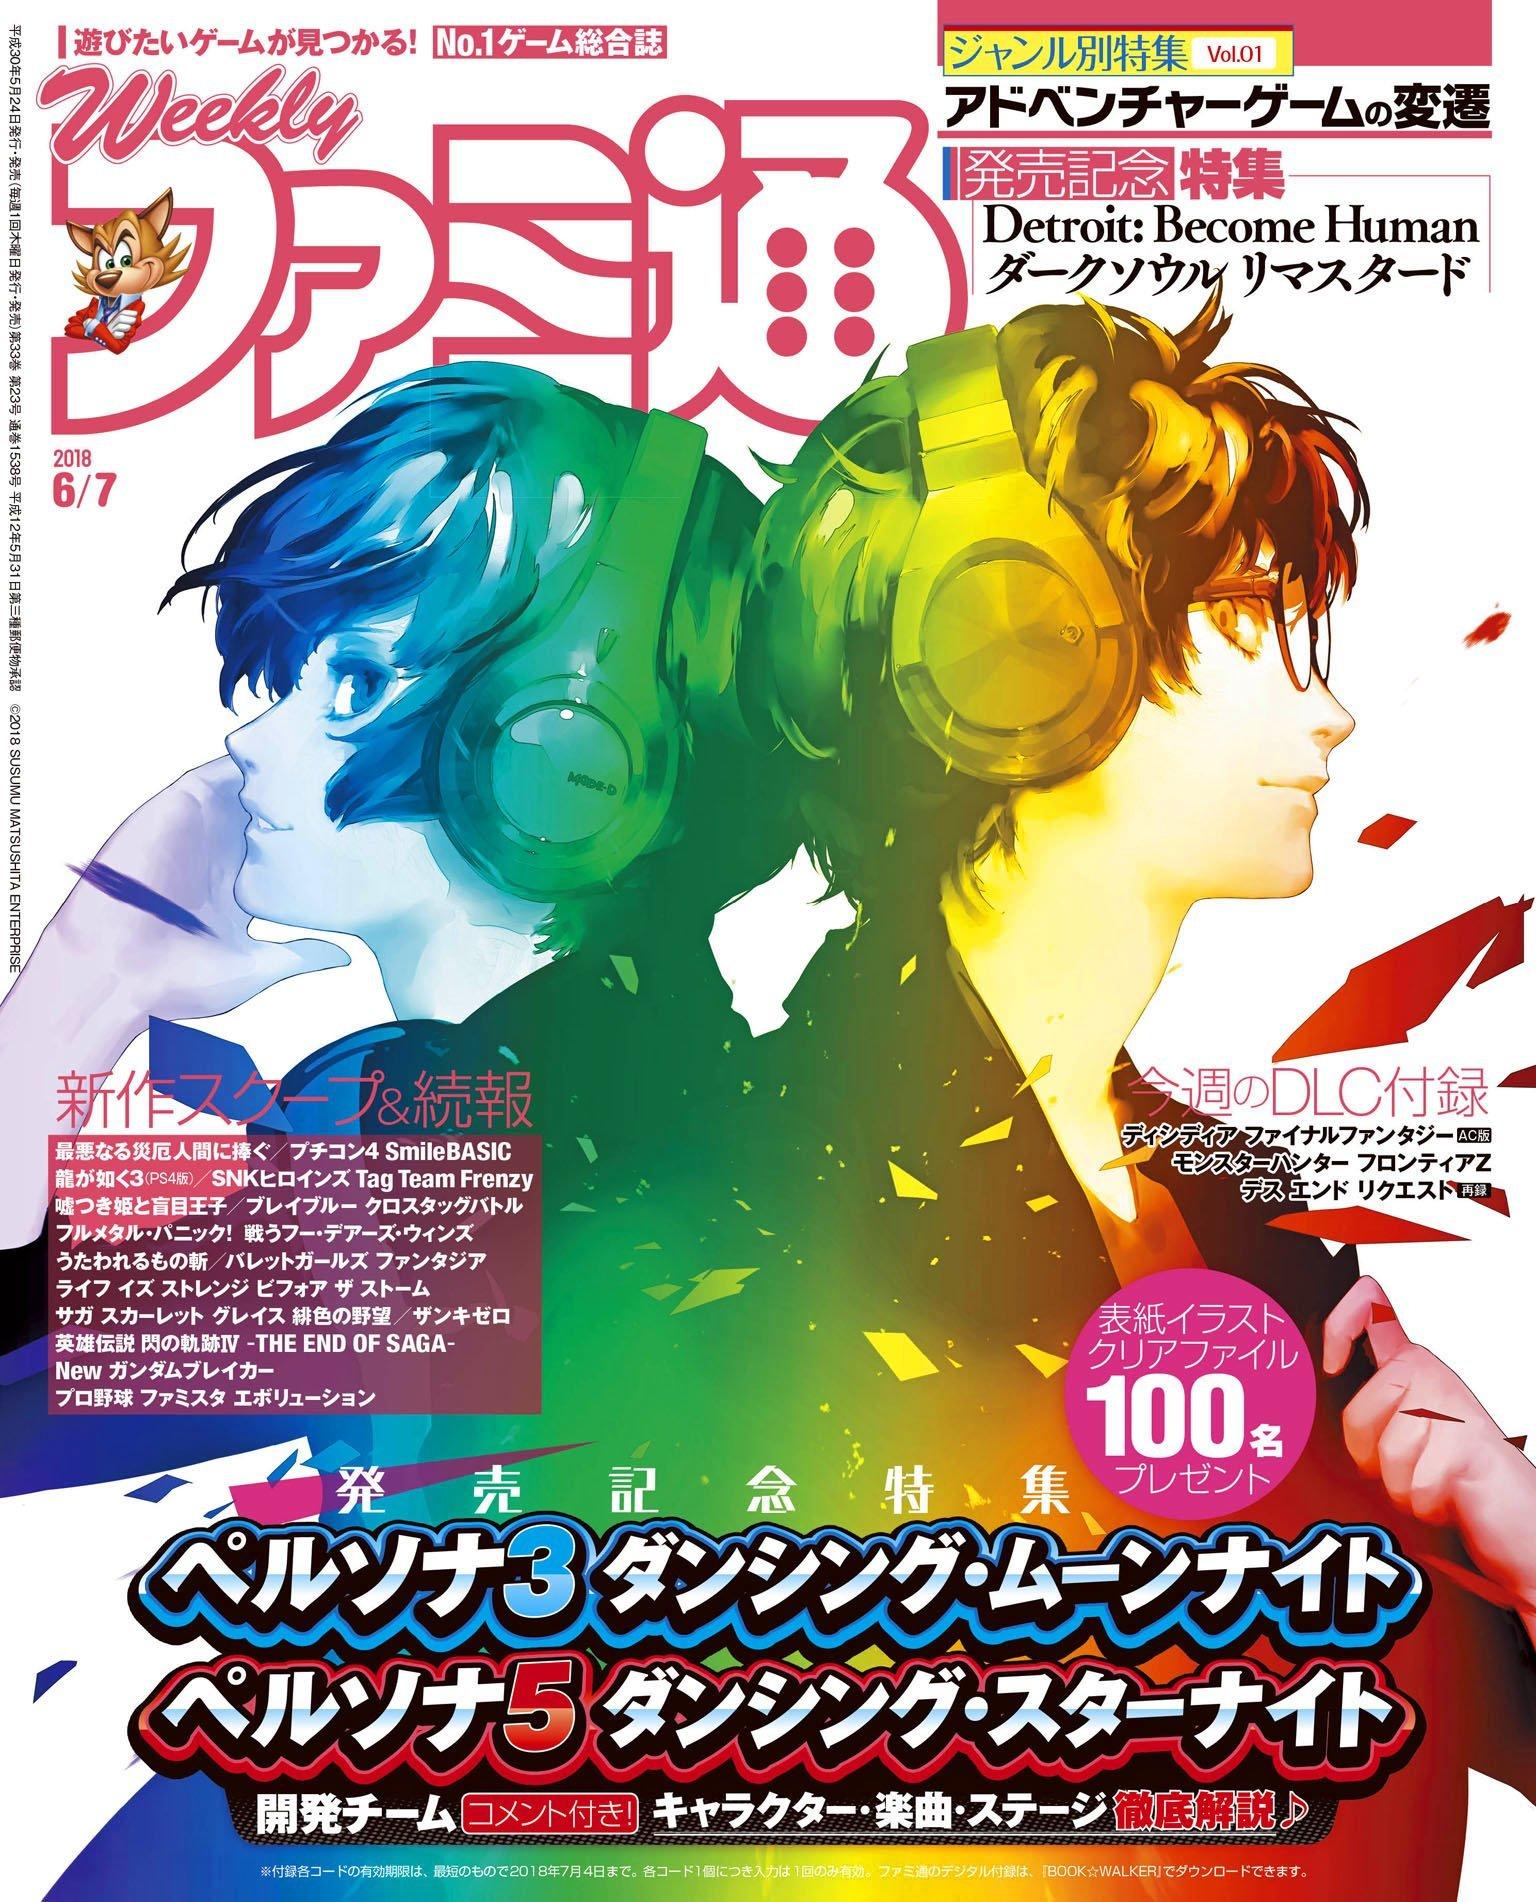 Famitsu 1538 (June 7, 2018)